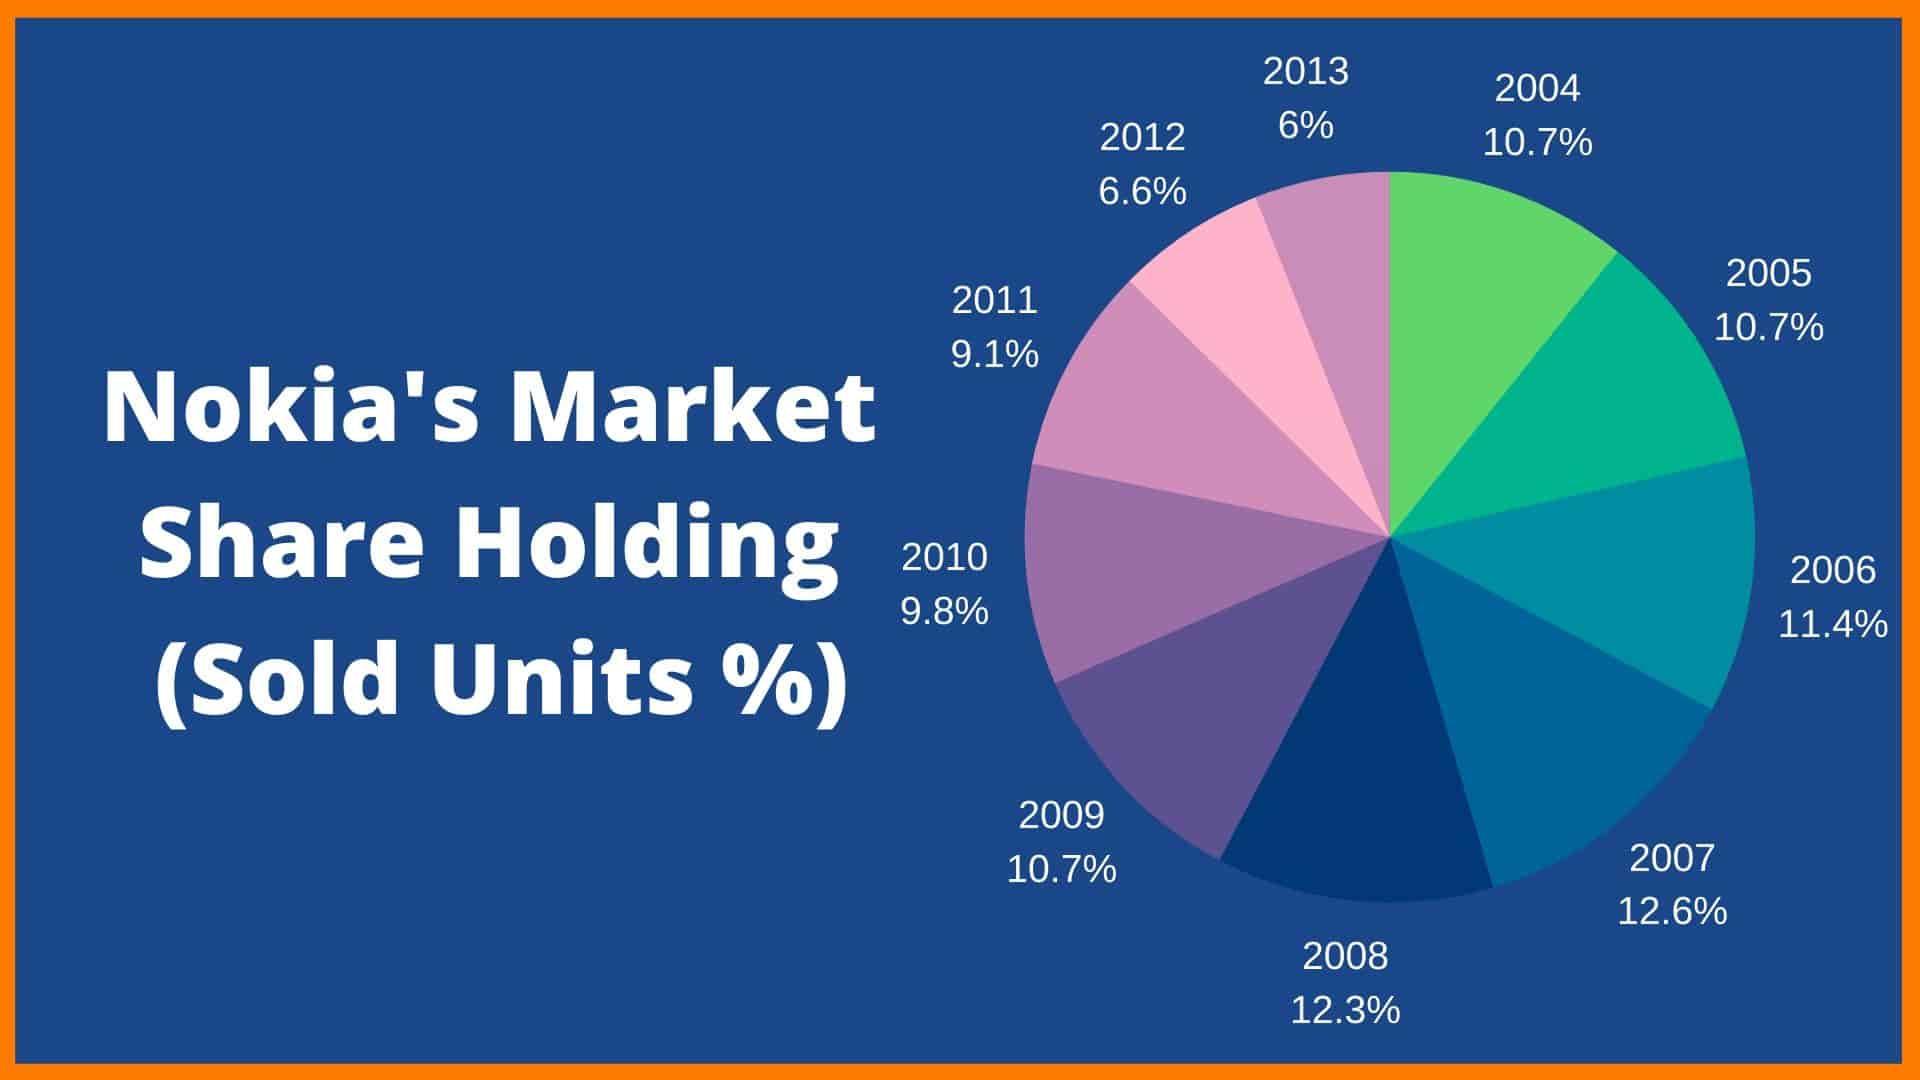 Nokia's Market Share Holding